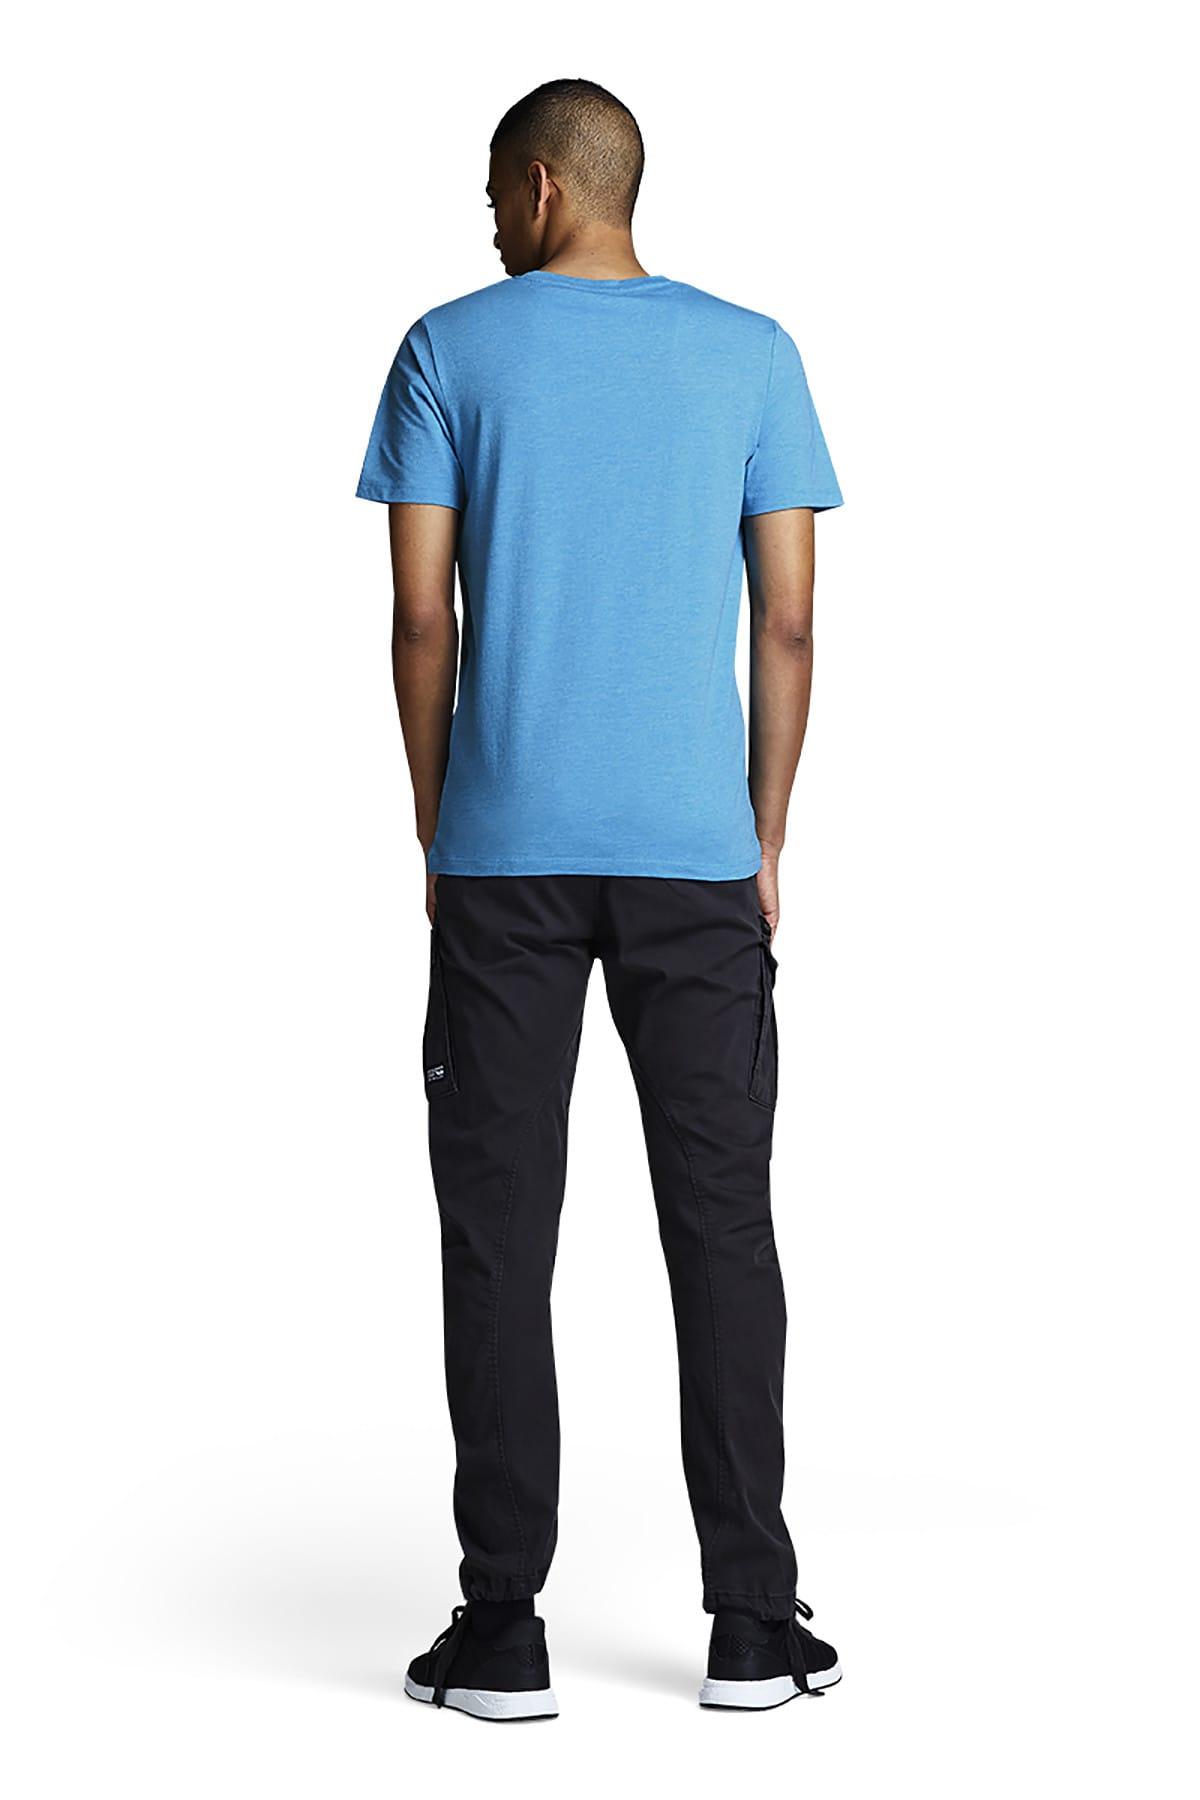 Jack & Jones T-shirt - Spring-Fell Core Tee 12146172 2